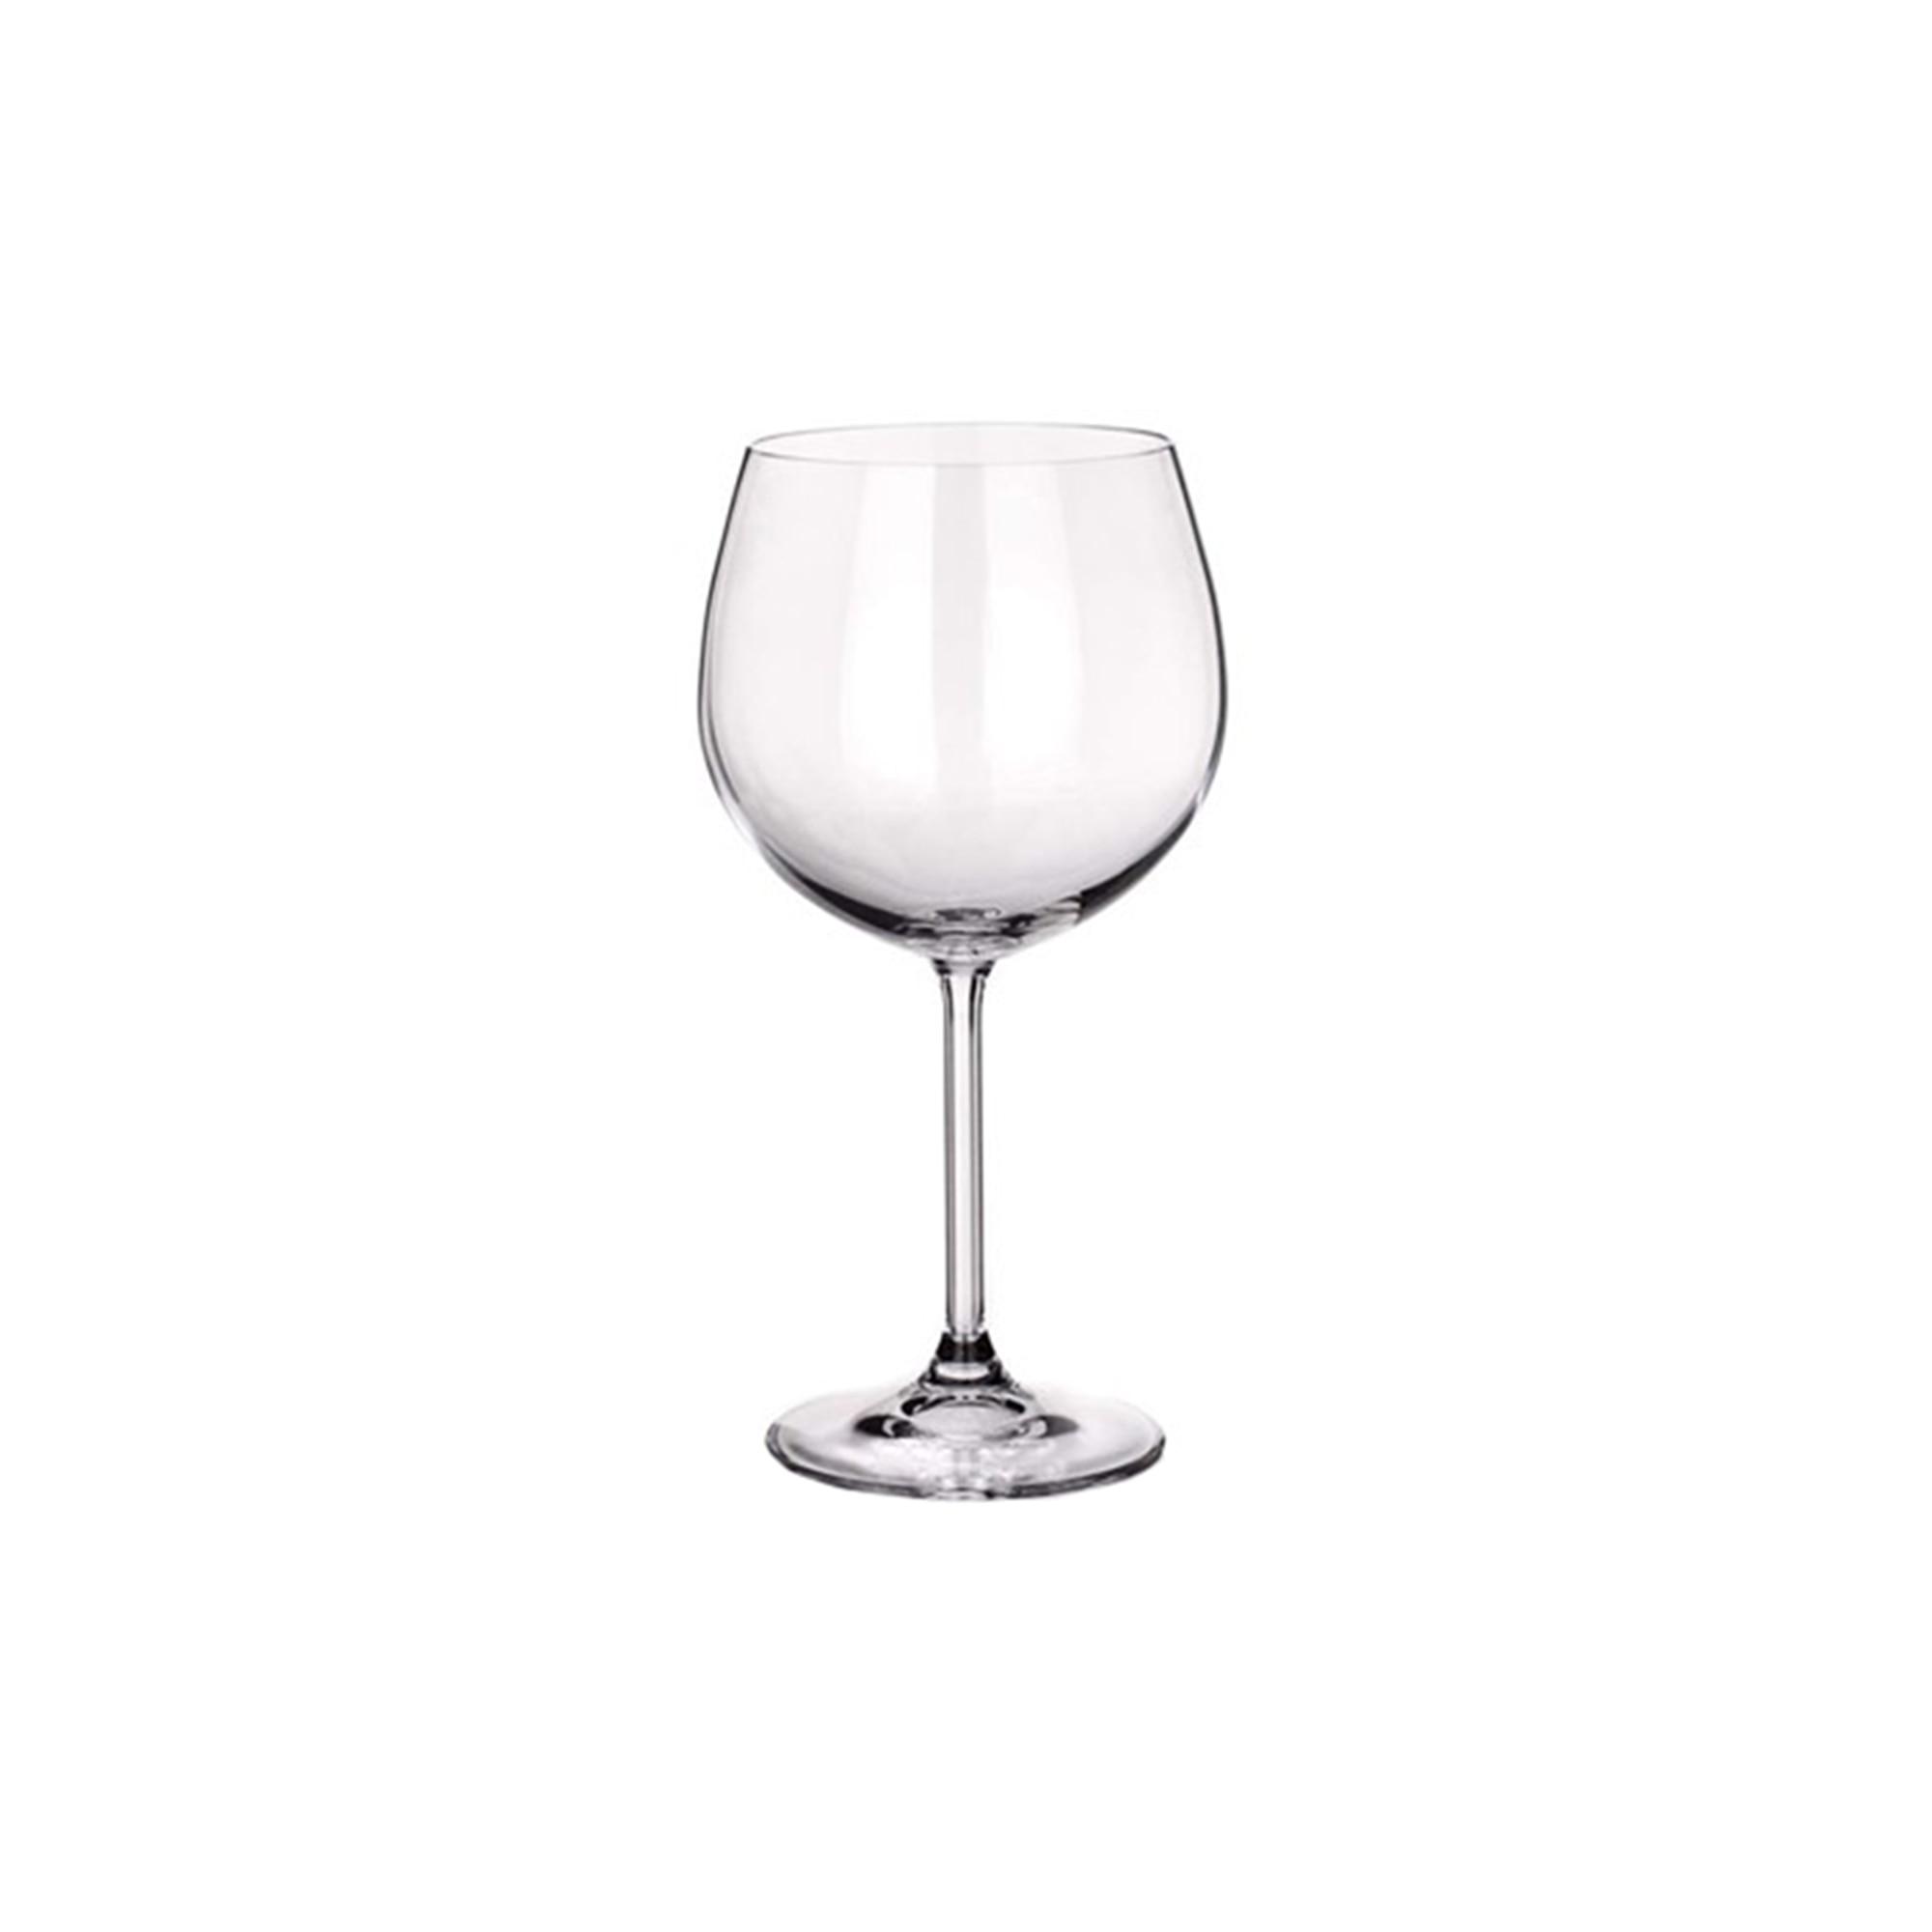 Fotografie Set 6 pahare Banquet vin rosu, cristal, 570ml